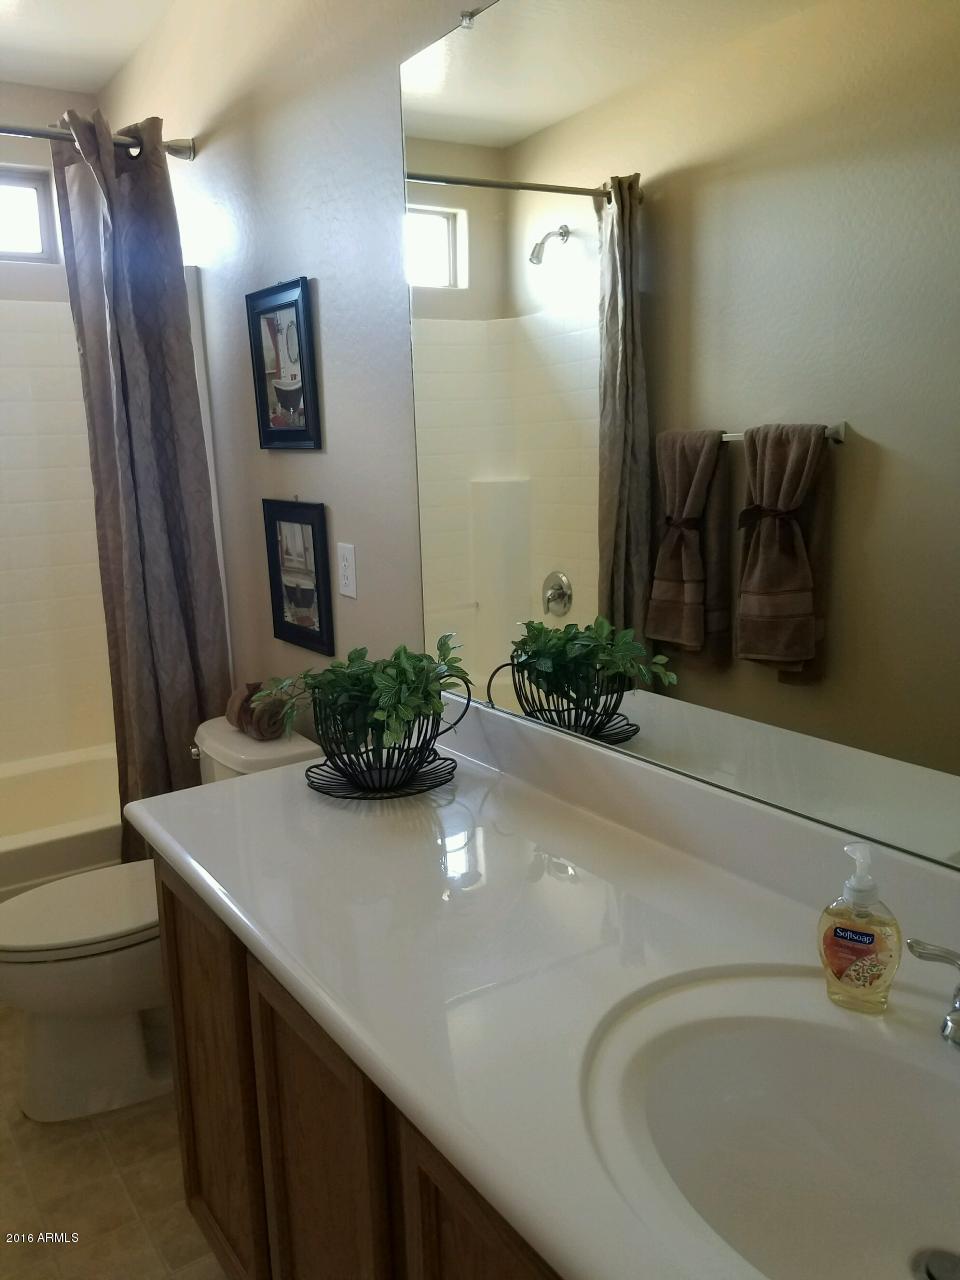 MLS 5487035 201 S CARTER RANCH Road, Coolidge, AZ 85128 Coolidge AZ Carter Ranch